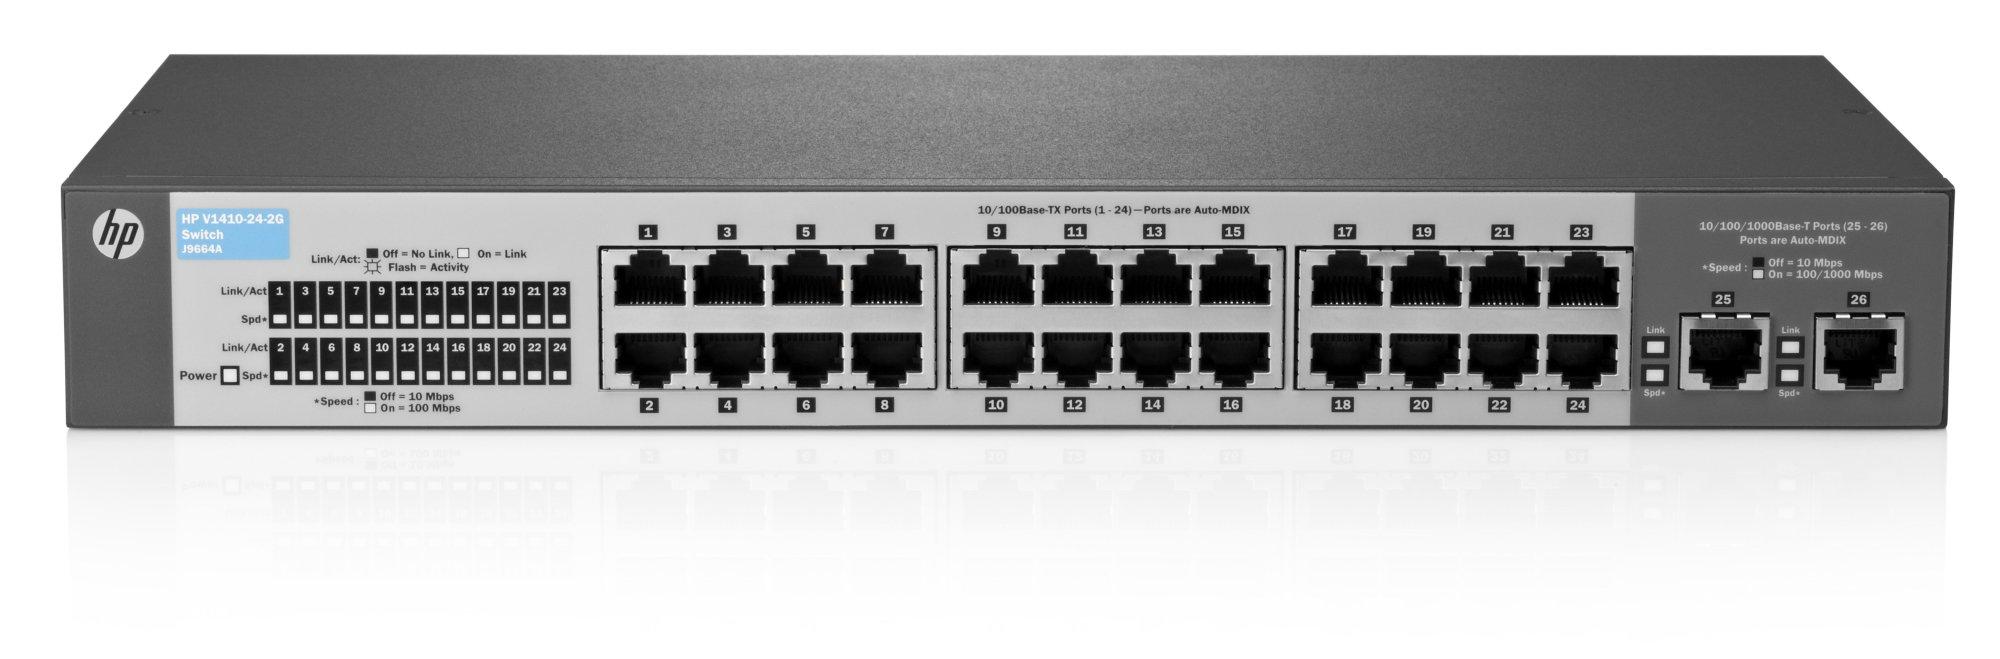 hight resolution of office depot 242g gigabit ethernet switch application diagram